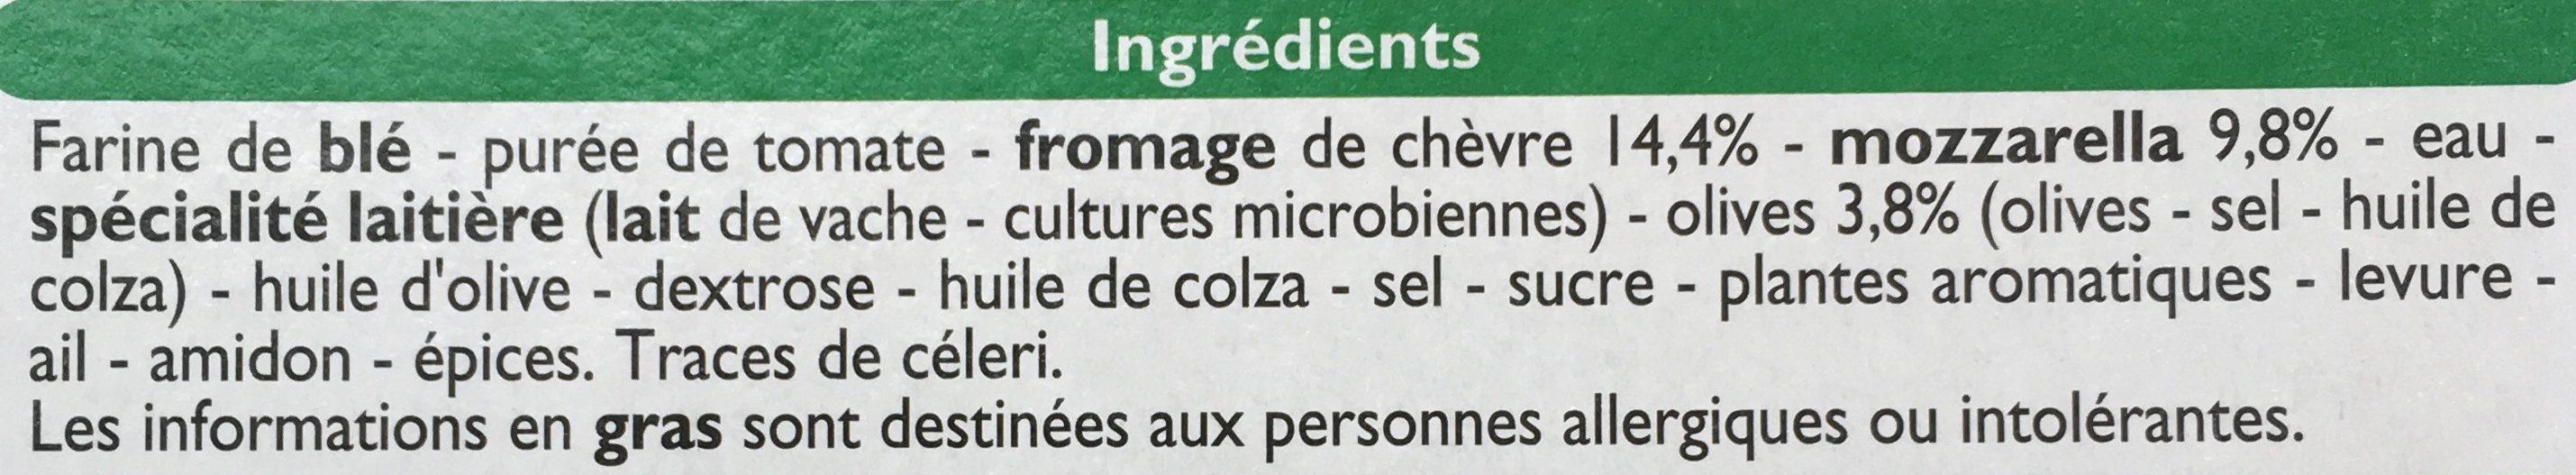 Pizza Chèvre, Cuite sur pierre - Ingrediënten